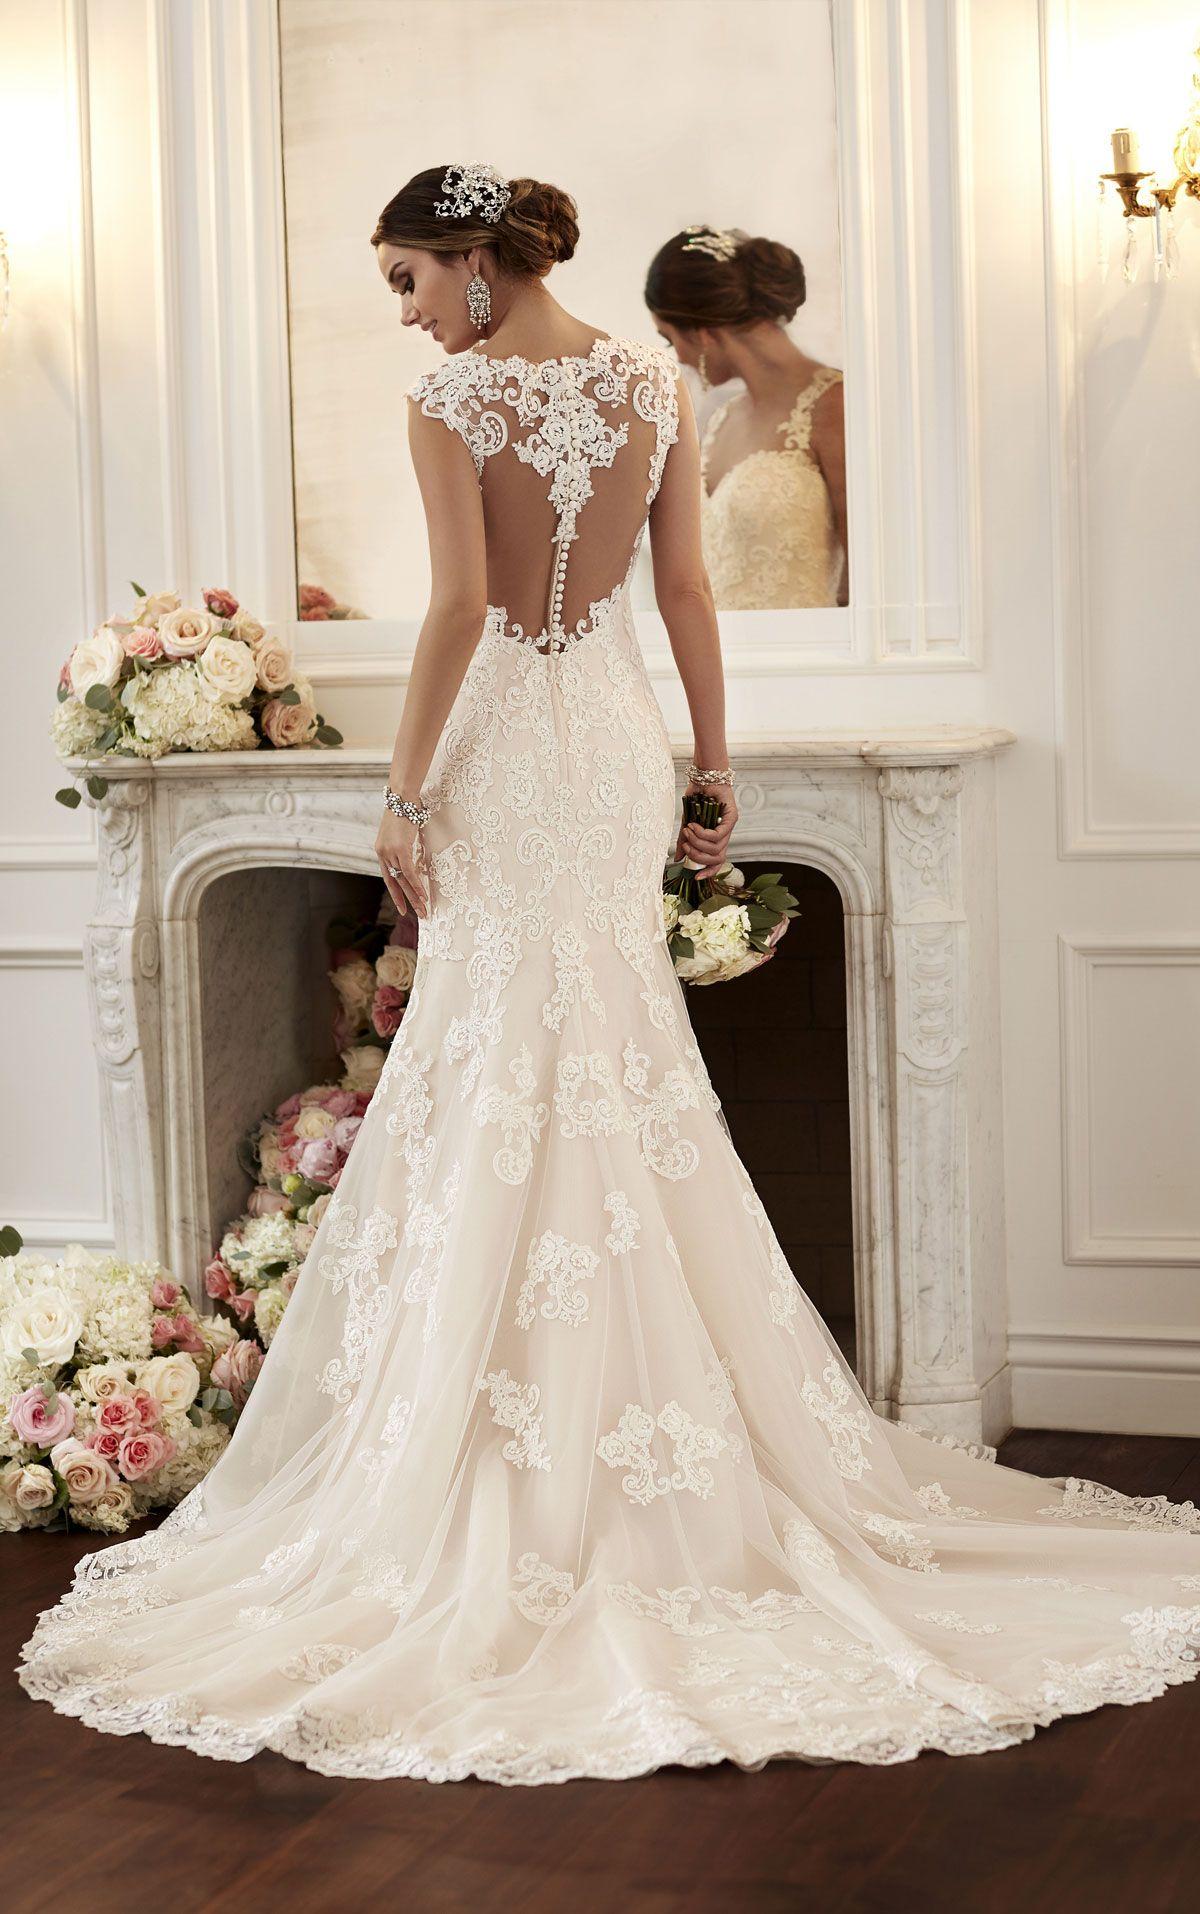 Vintage Inspired Wedding Dresses With Straps Stella York Wedding Dresses Wedding Dresses Lace 2016 Wedding Dresses